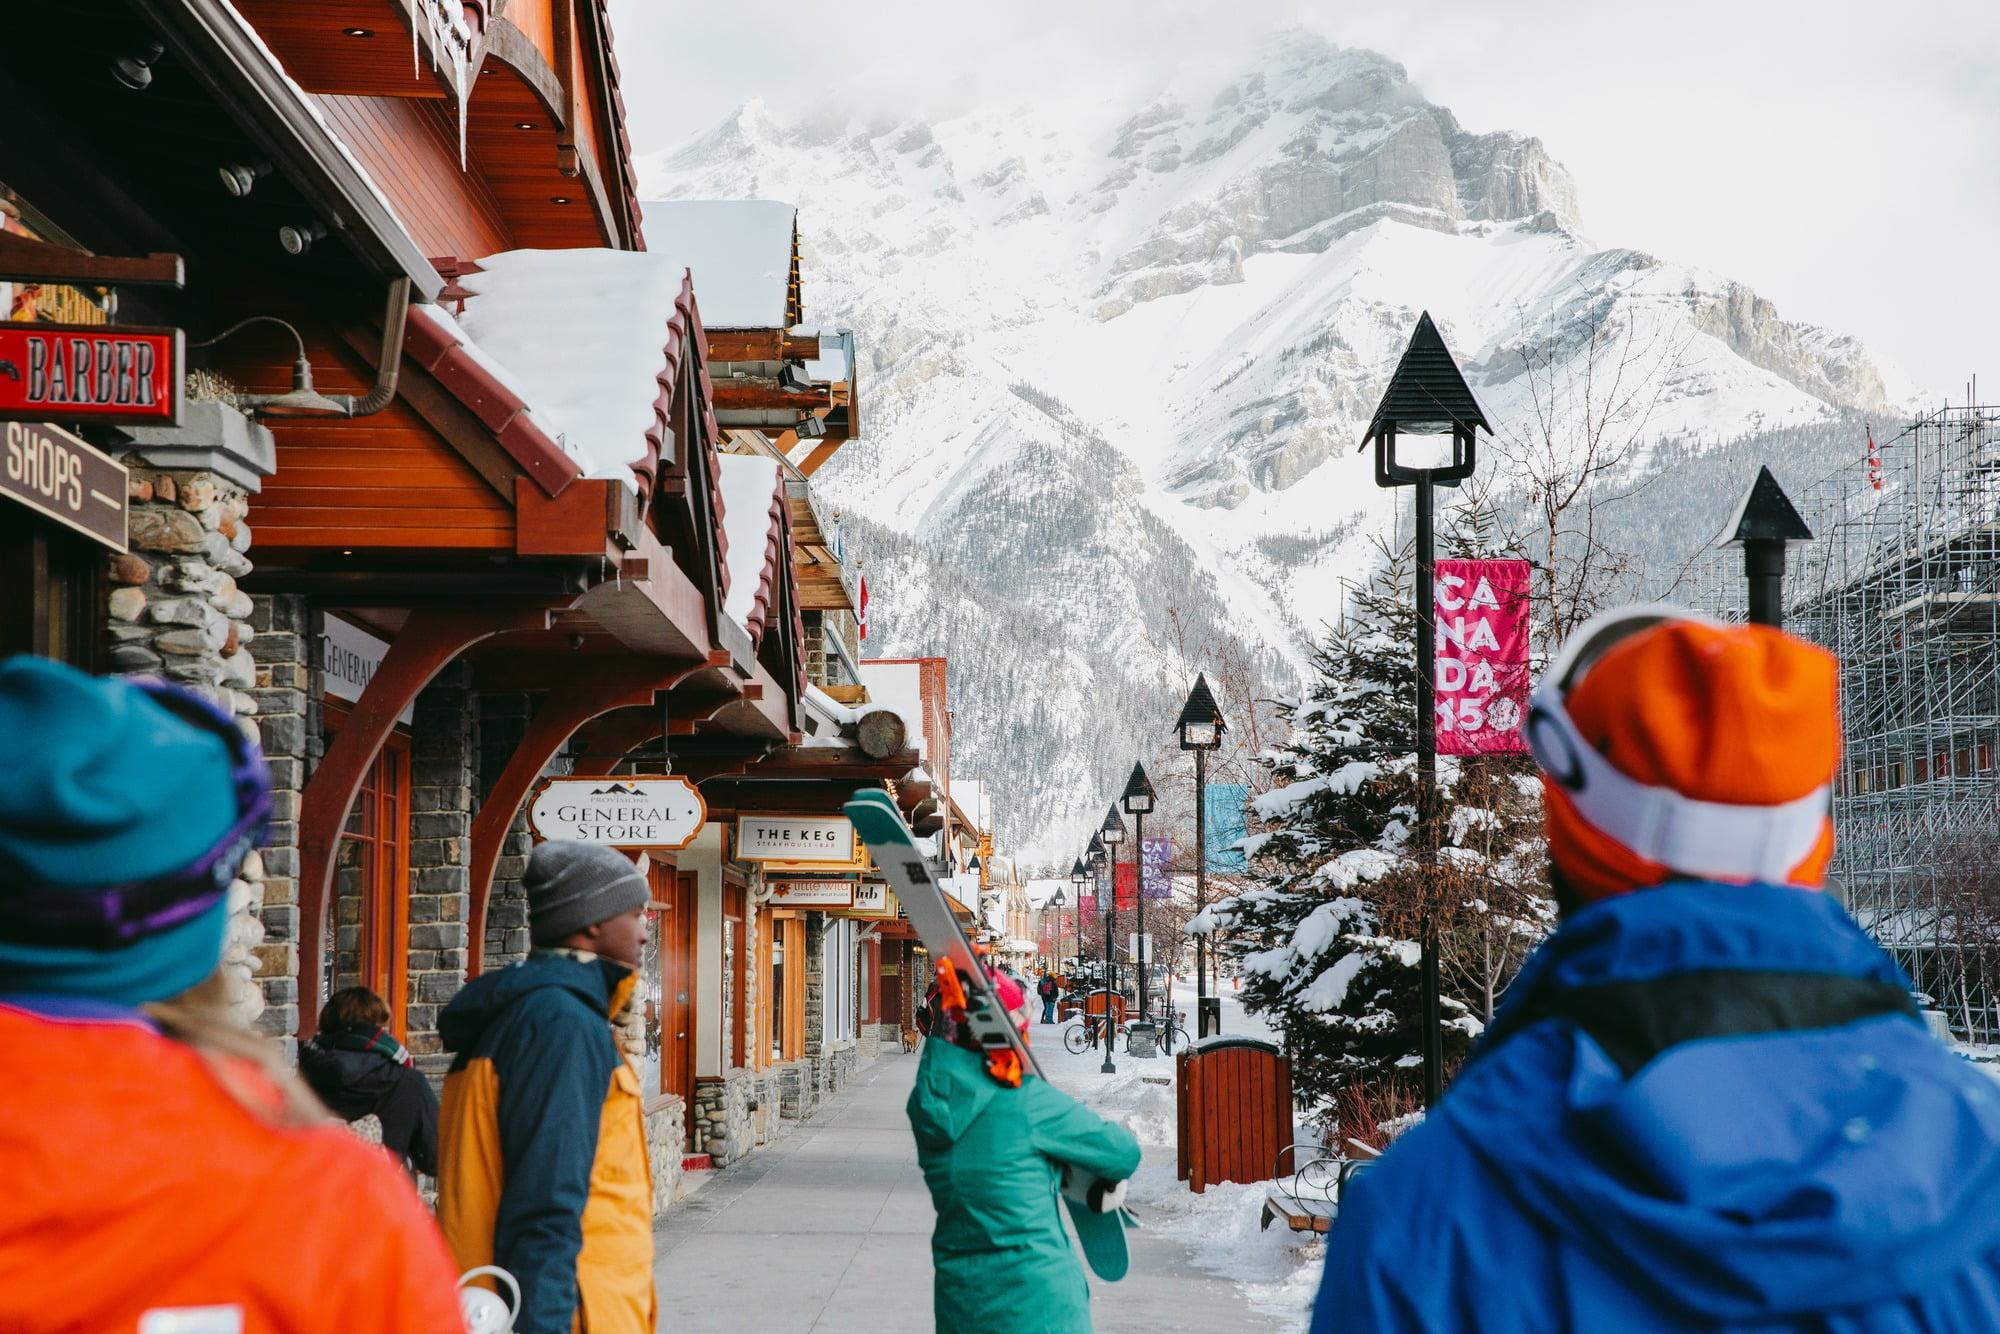 People walking through town of Banff with skis